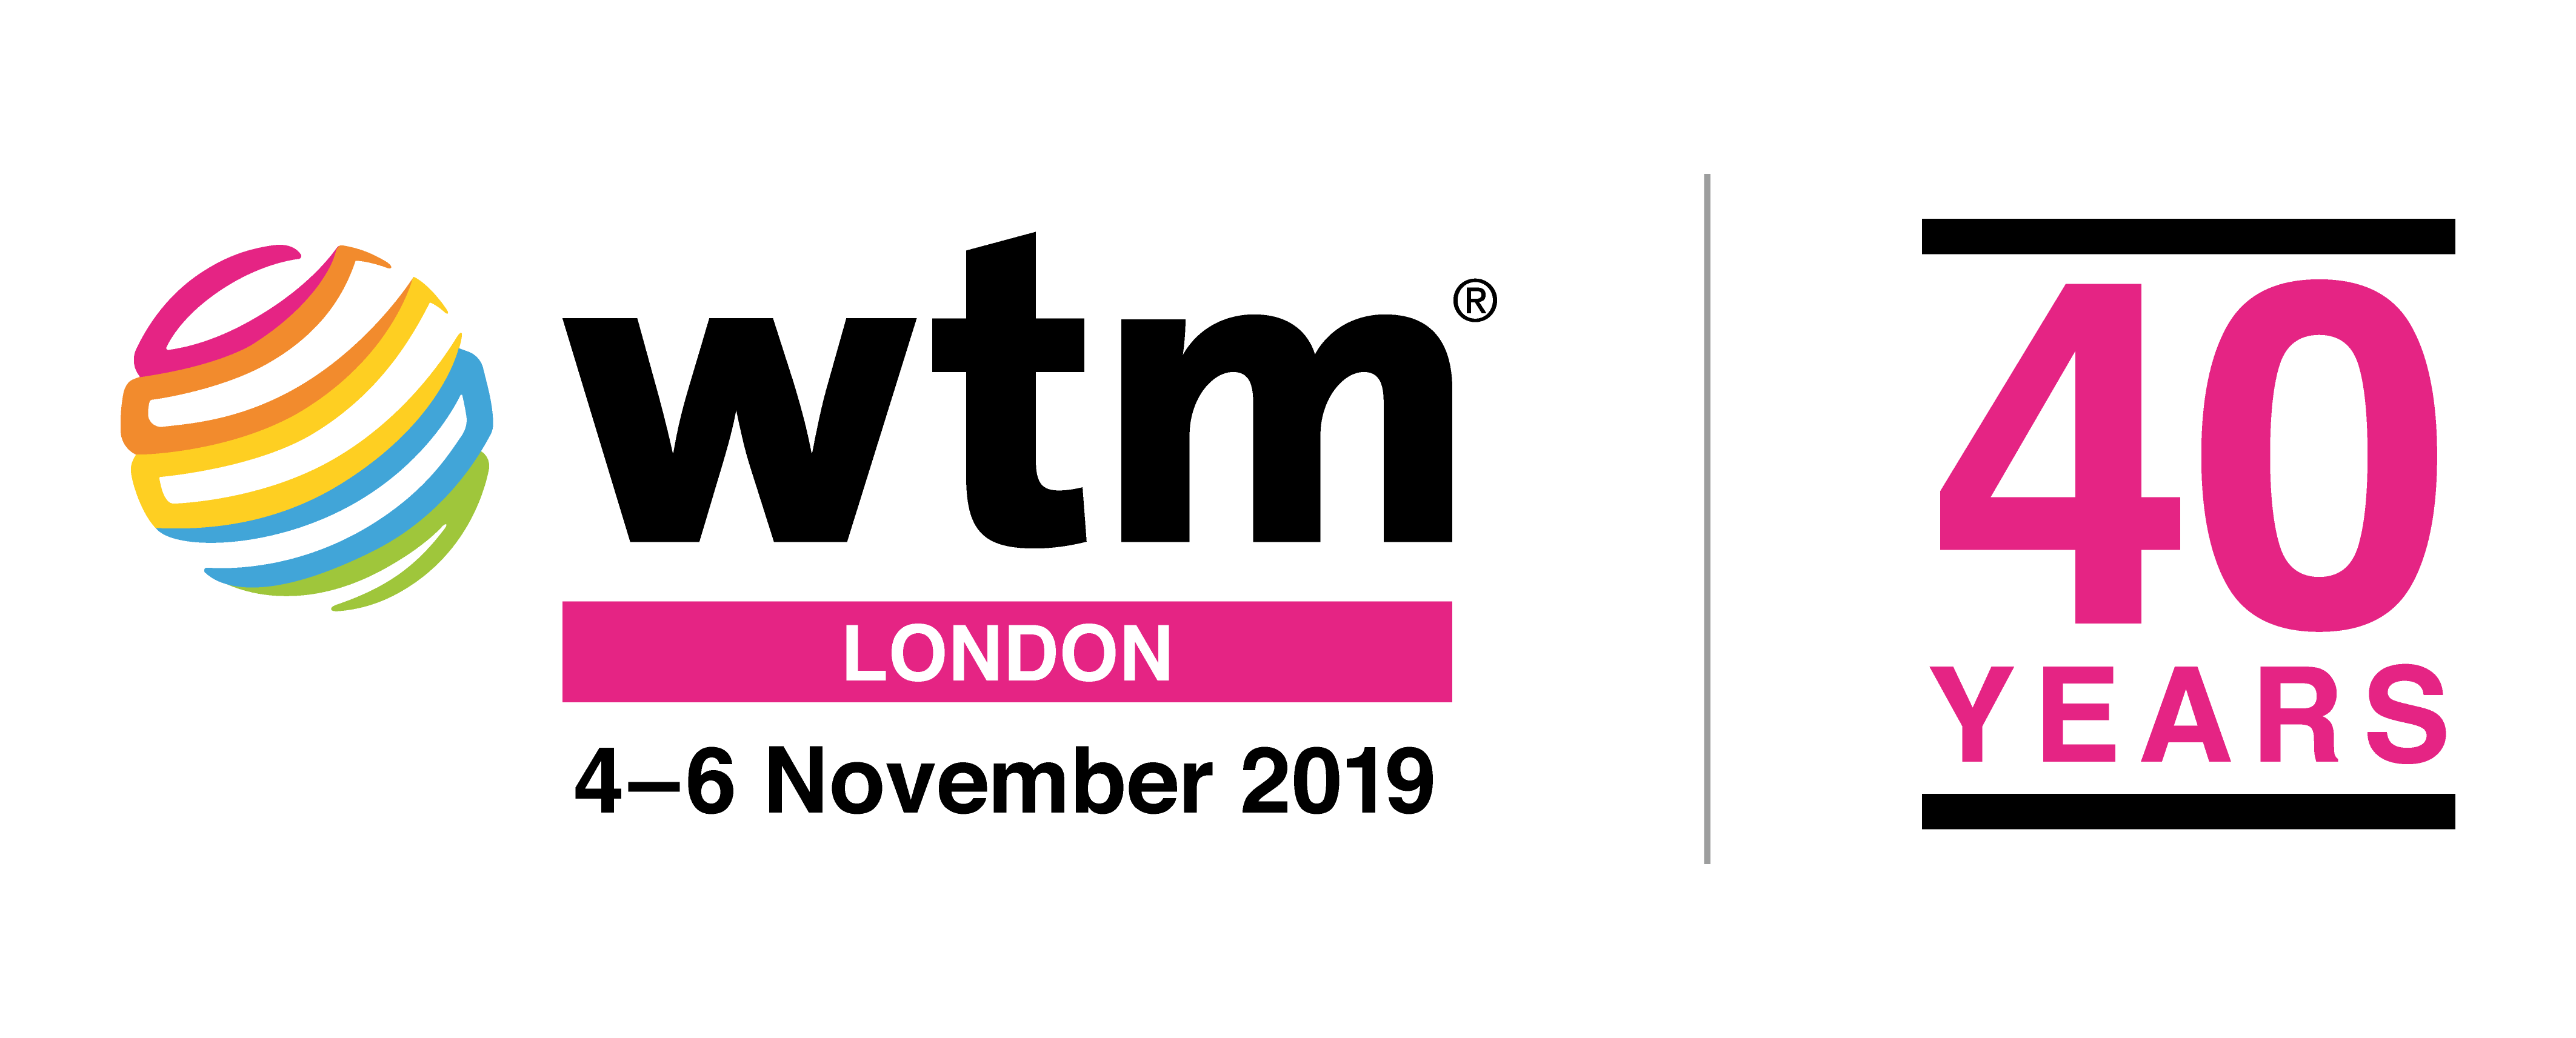 wtm_london_19_logo_40years